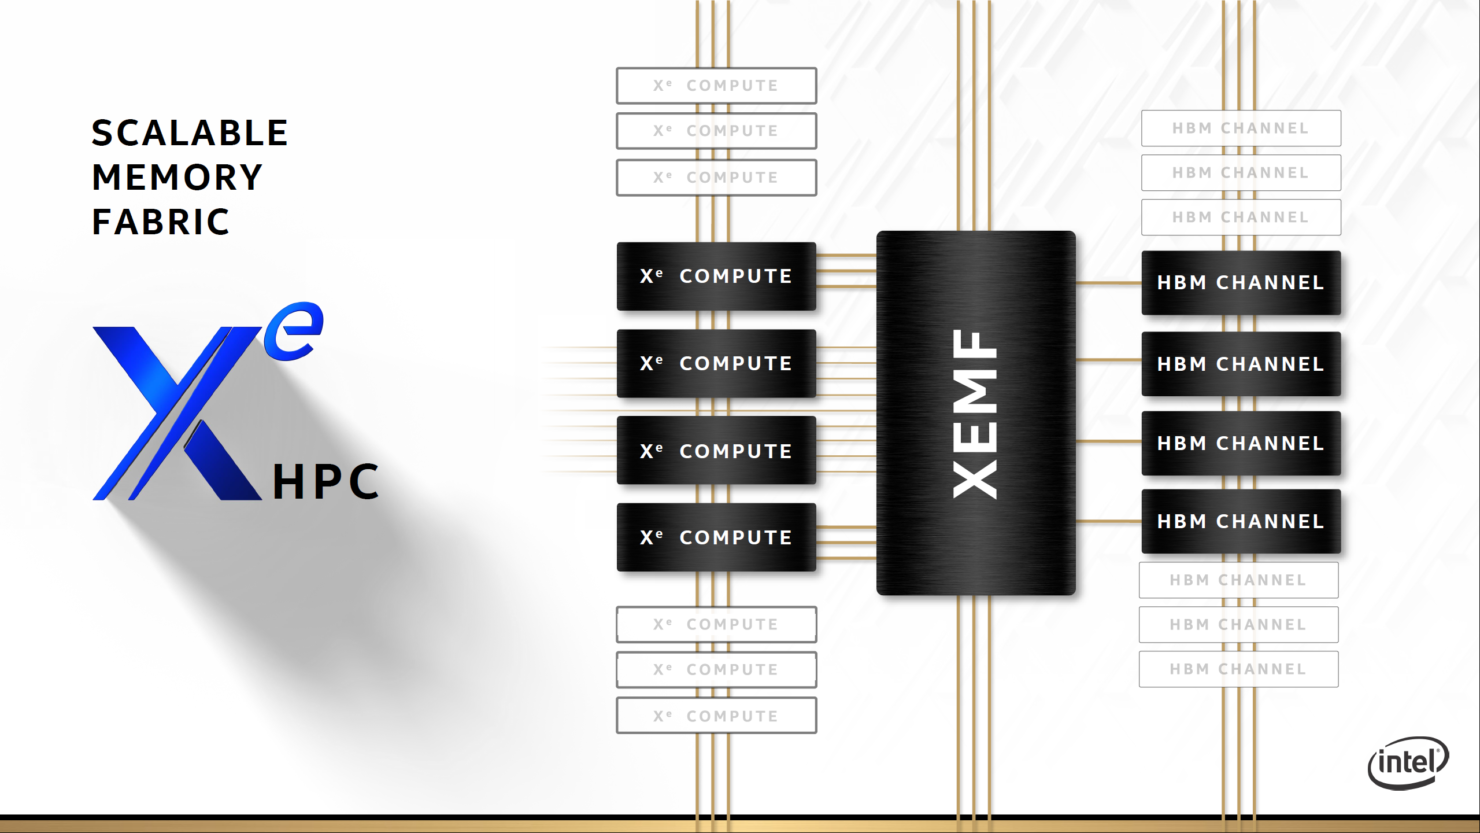 intel-xe-gpu_discrete-graphics-card_25